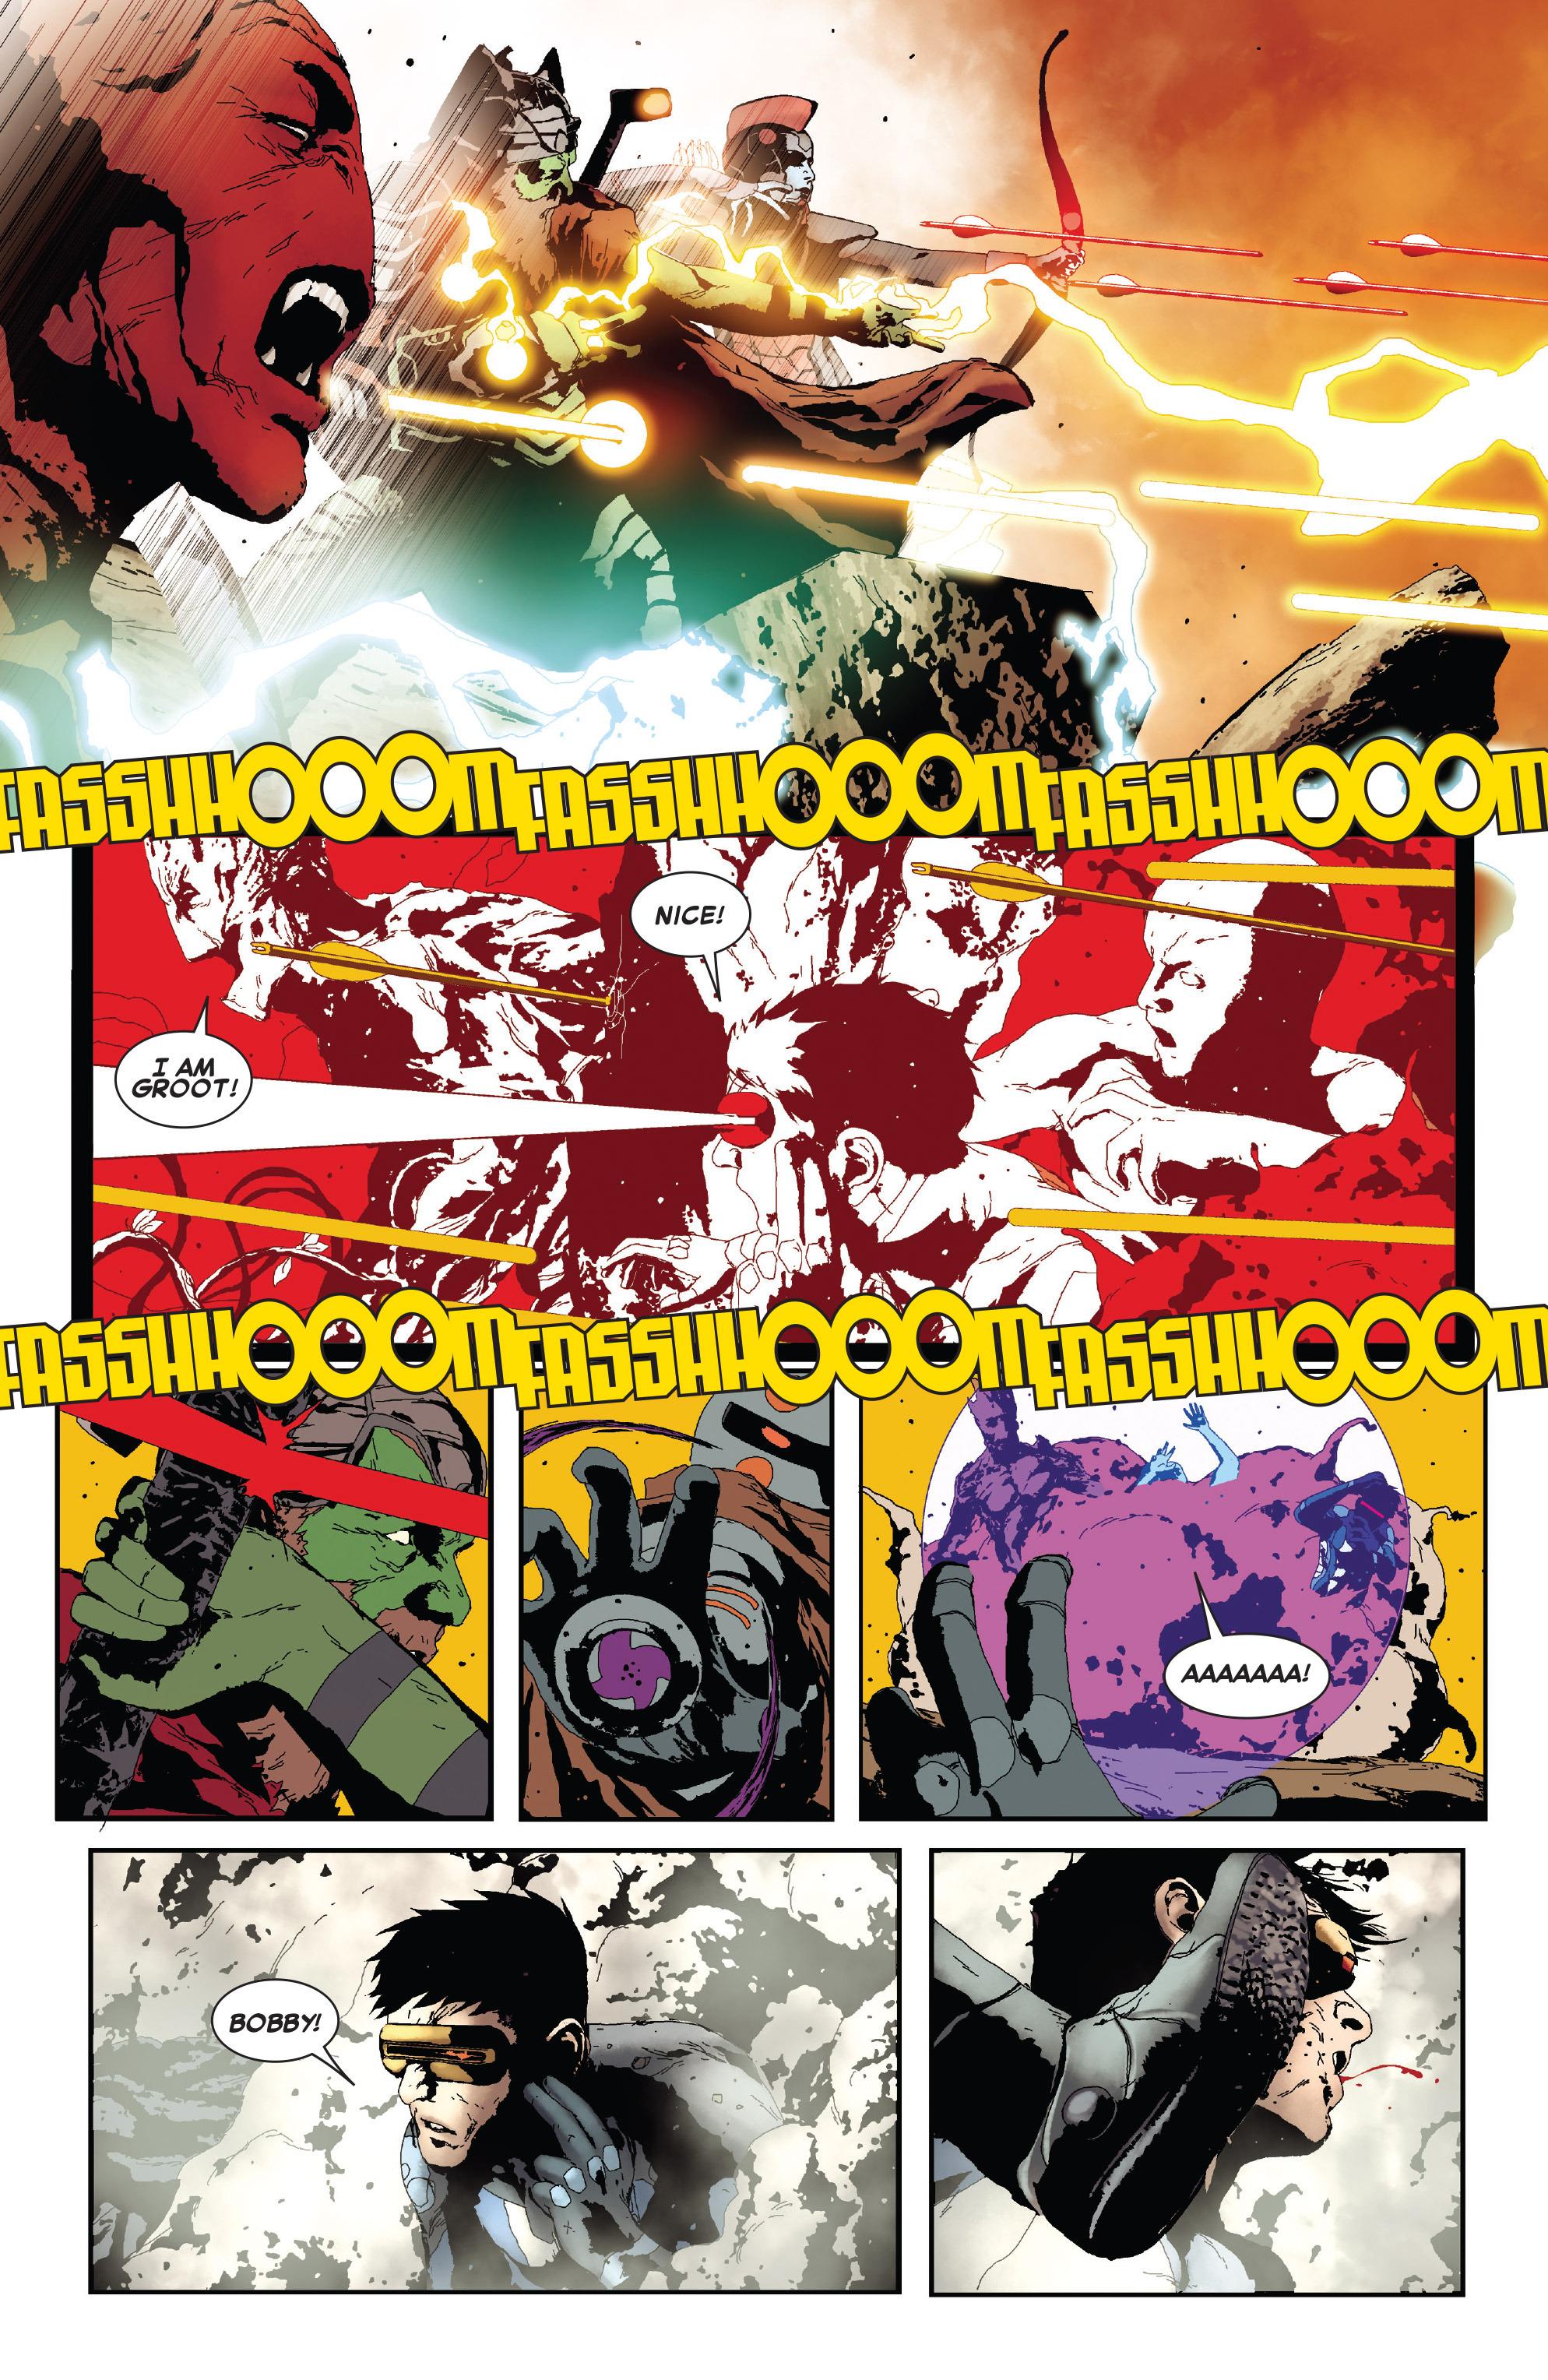 All-New X-Men (2013) chap 39 pic 17